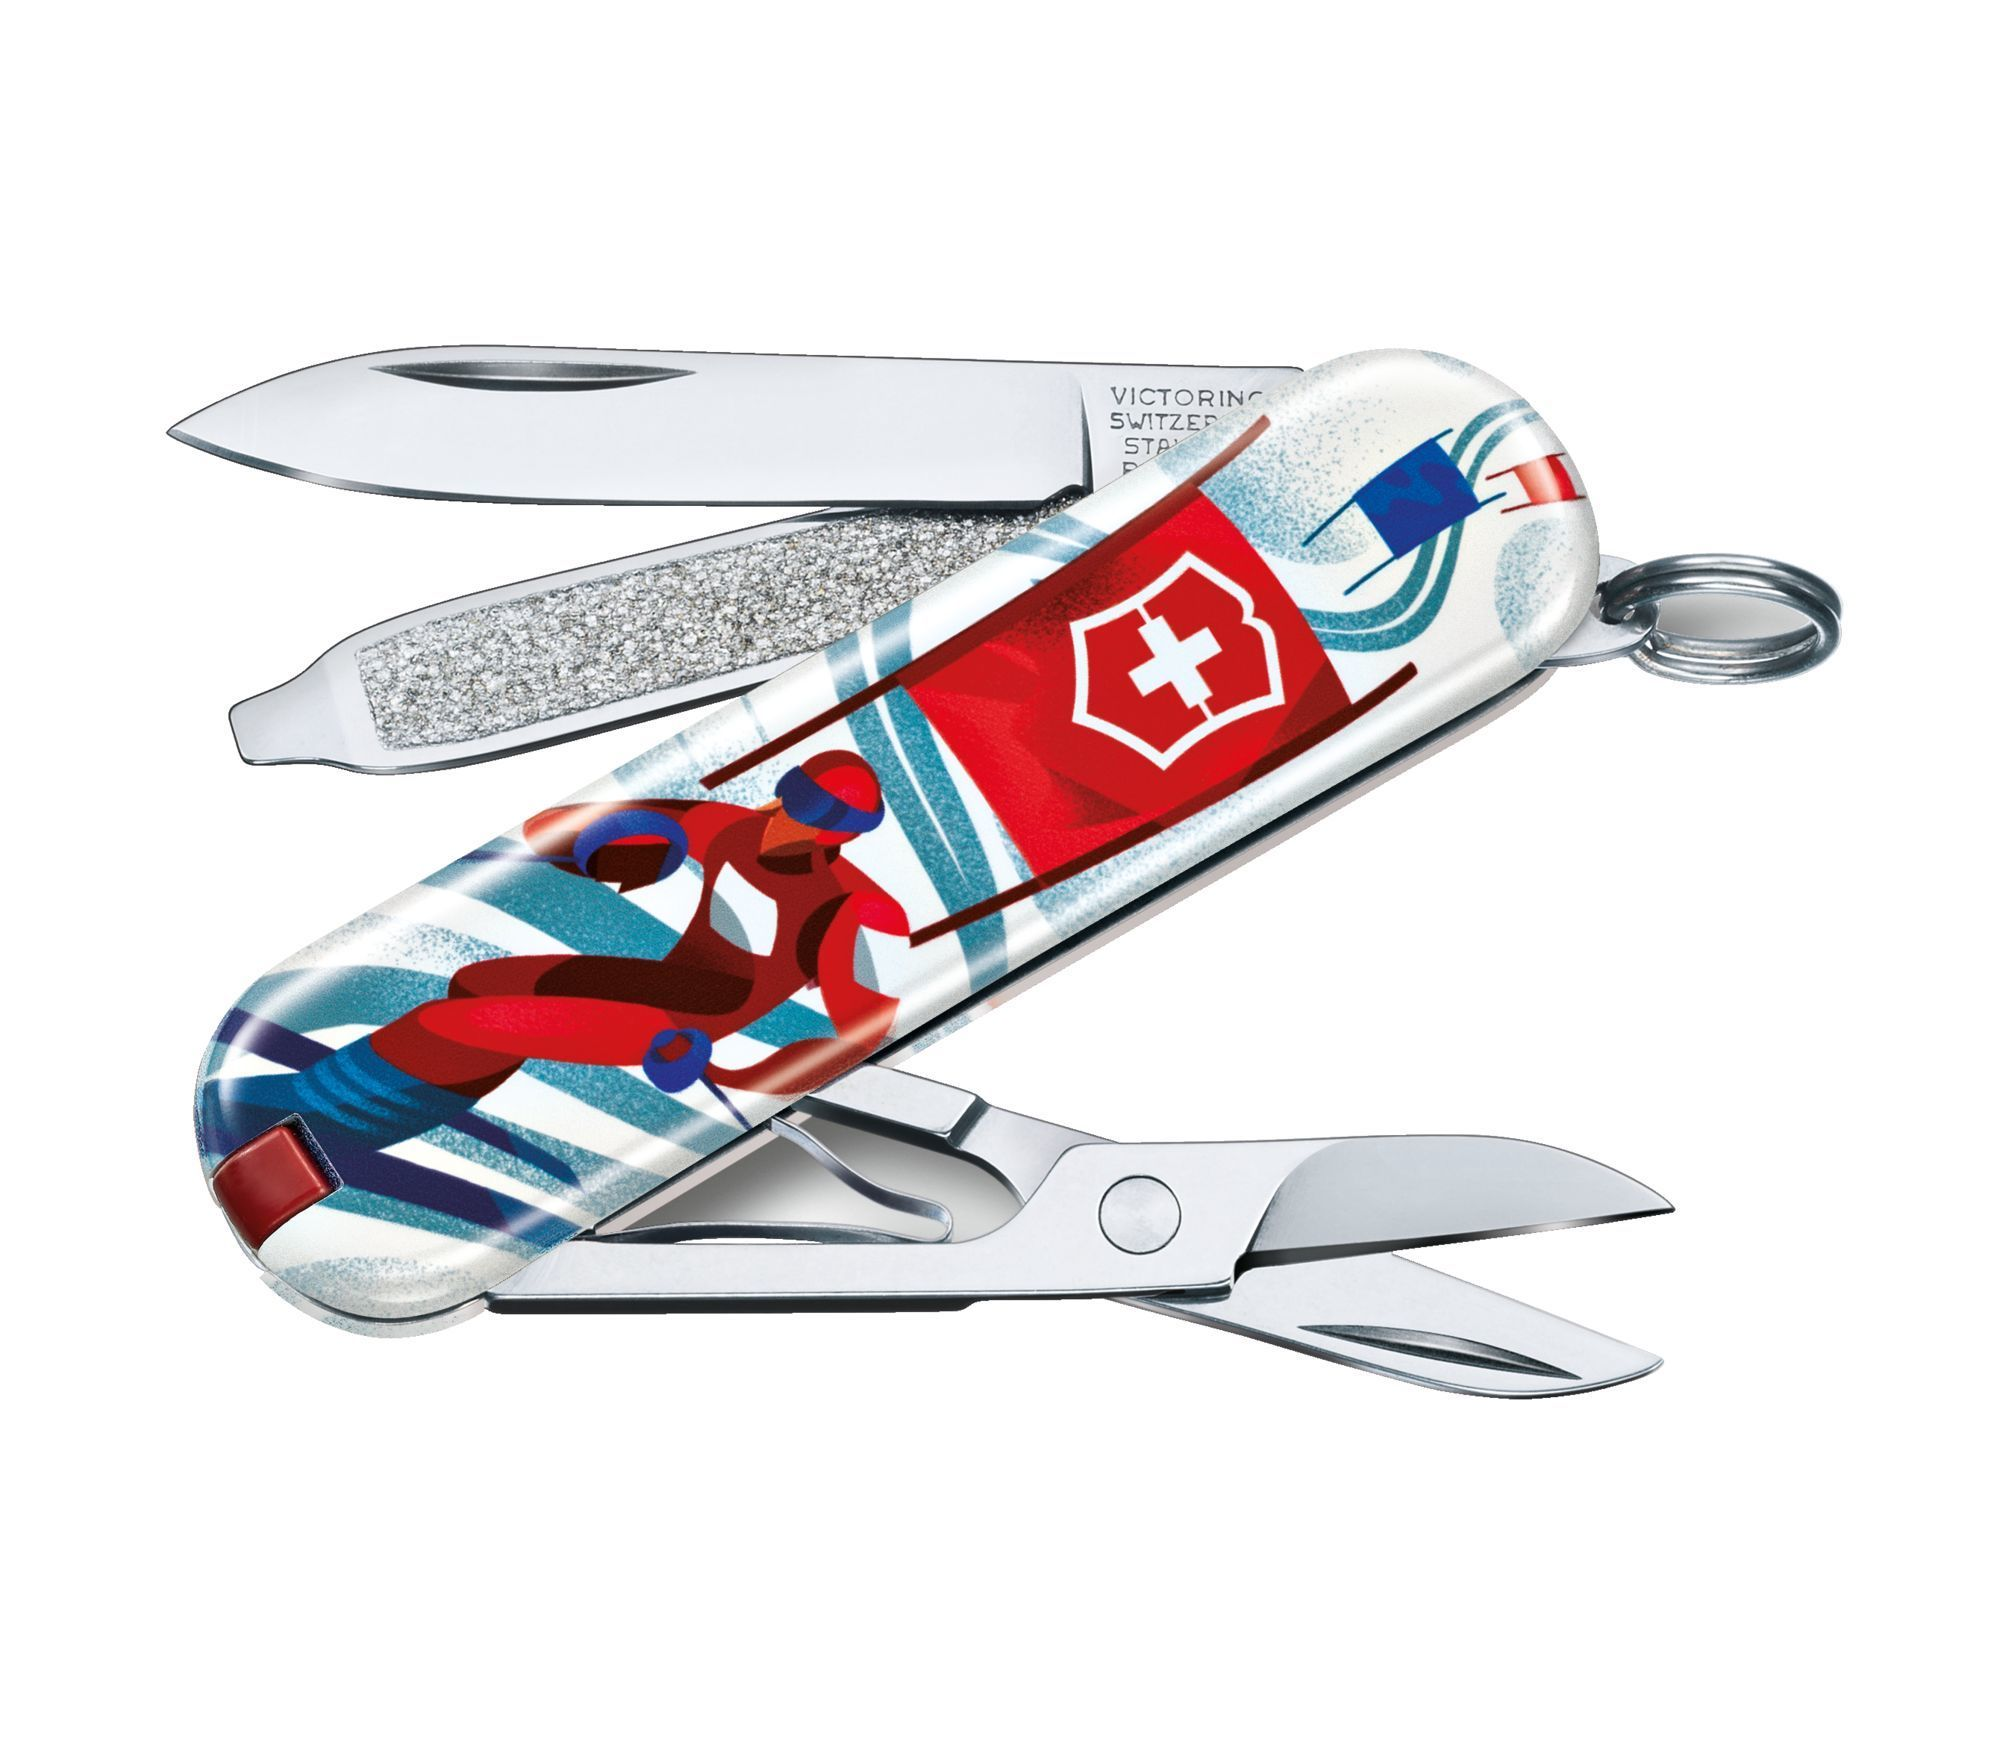 Складной нож Victorinox Classic LE2020 Ski Race, 58 мм 7 функций складной нож victorinox classic le2020 ski race 7 функций 58мм синий рисунок